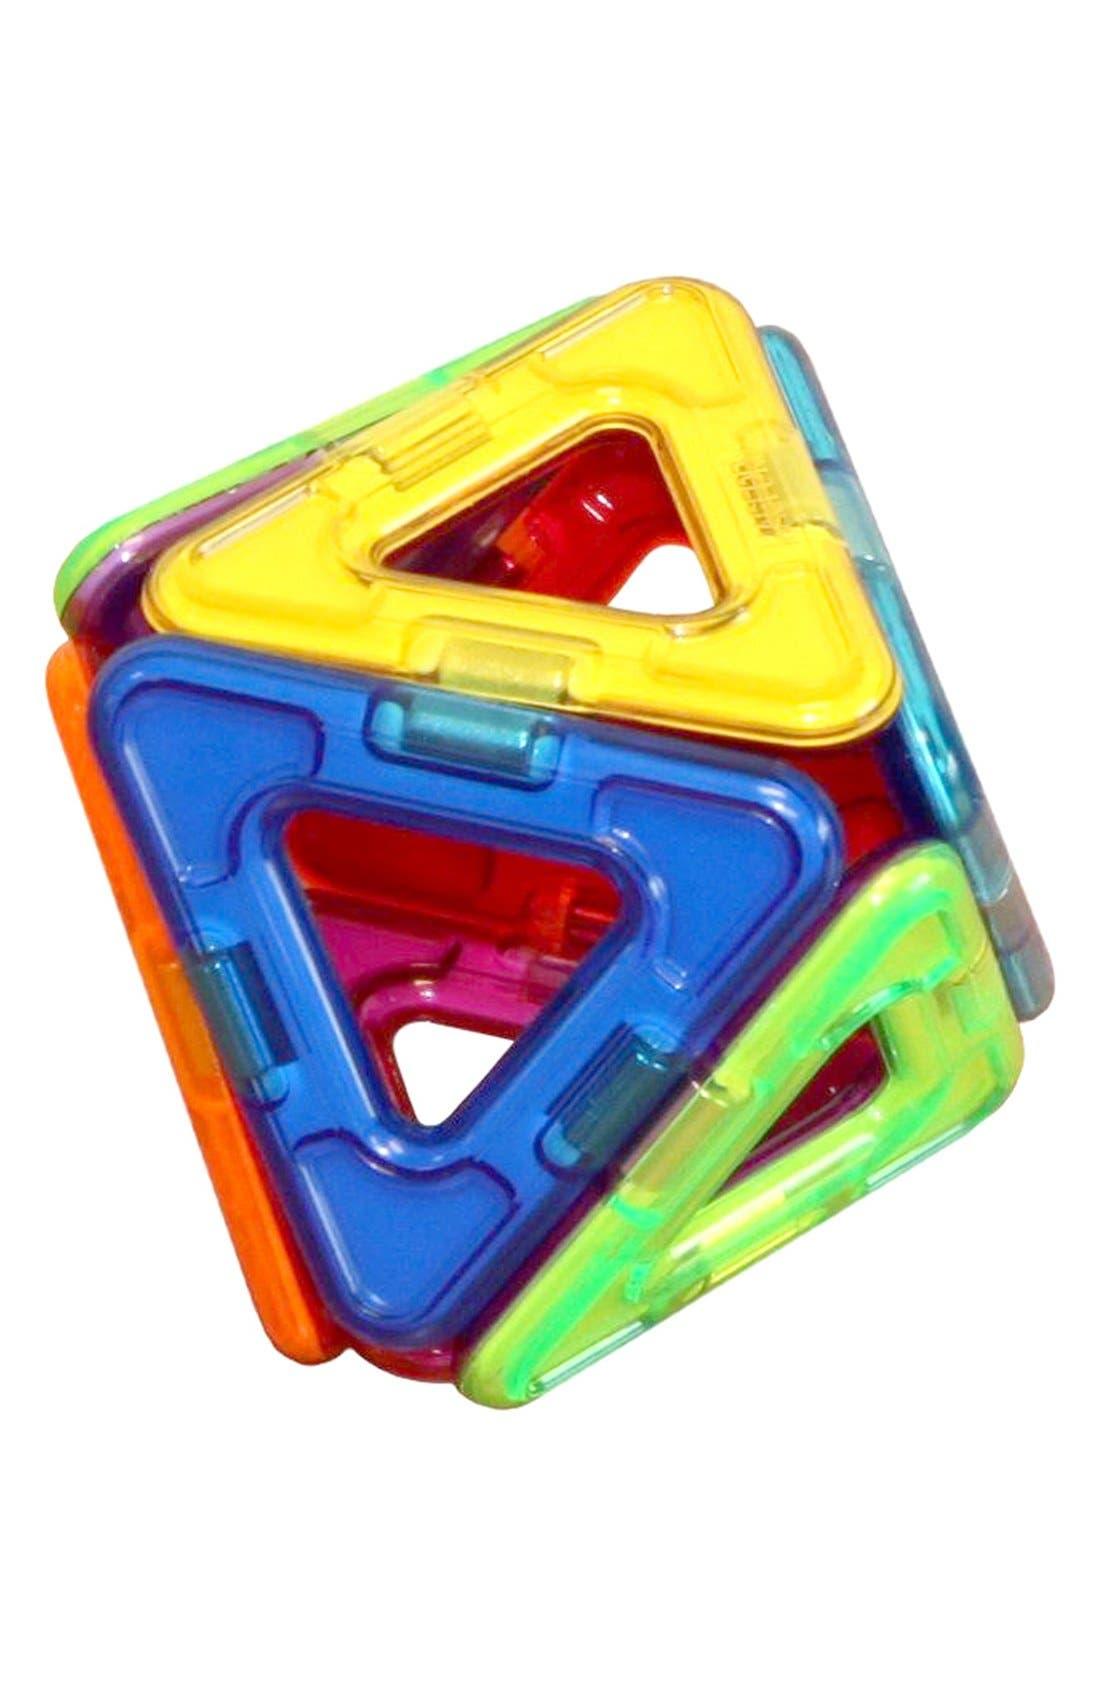 'Triangles' Construction Set,                             Alternate thumbnail 2, color,                             960